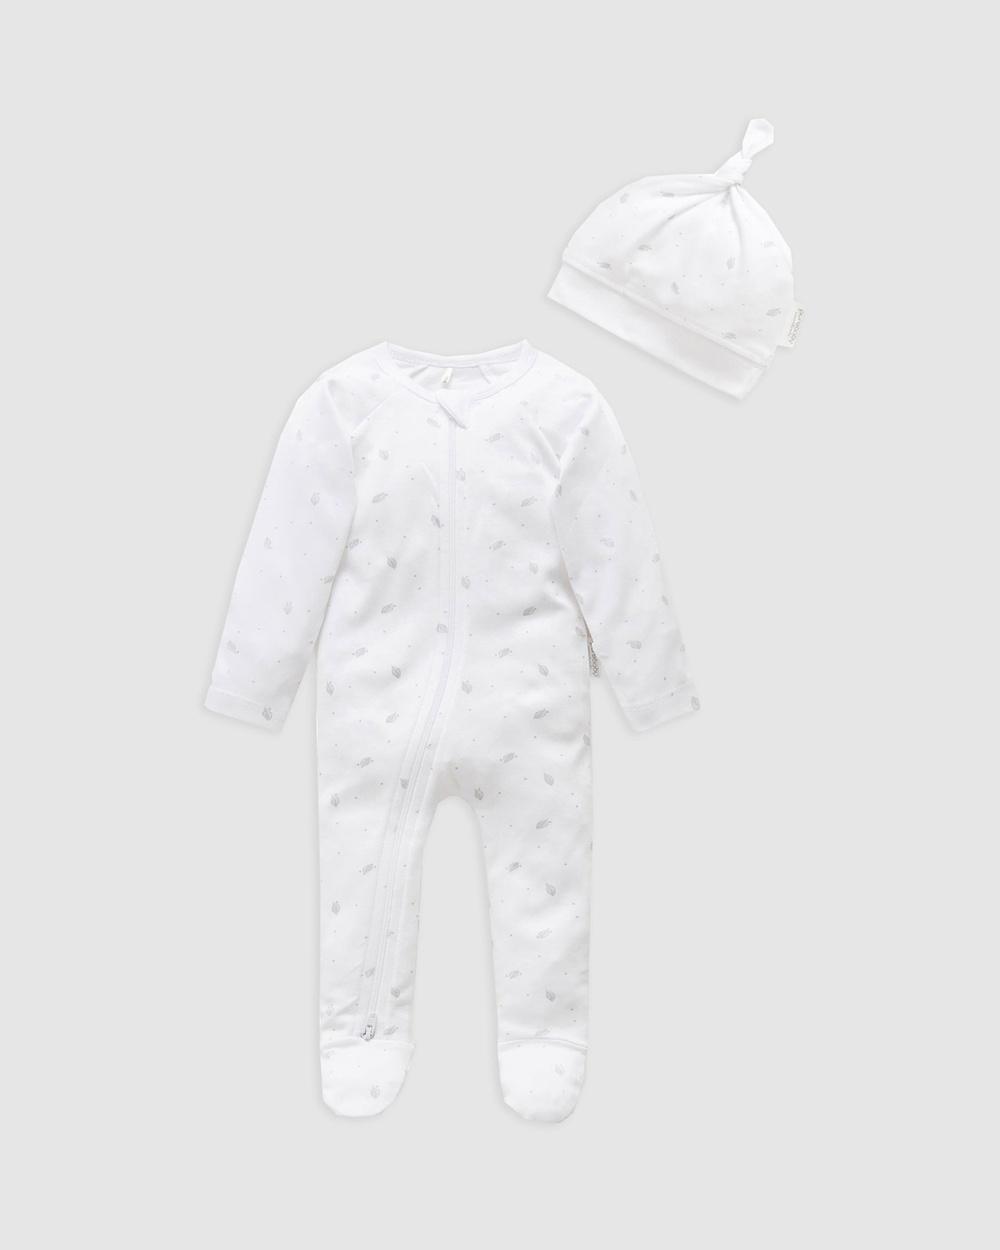 Purebaby Zip Growsuit & Hat Pack Babies Headwear Pale Grey Leaf with Spot